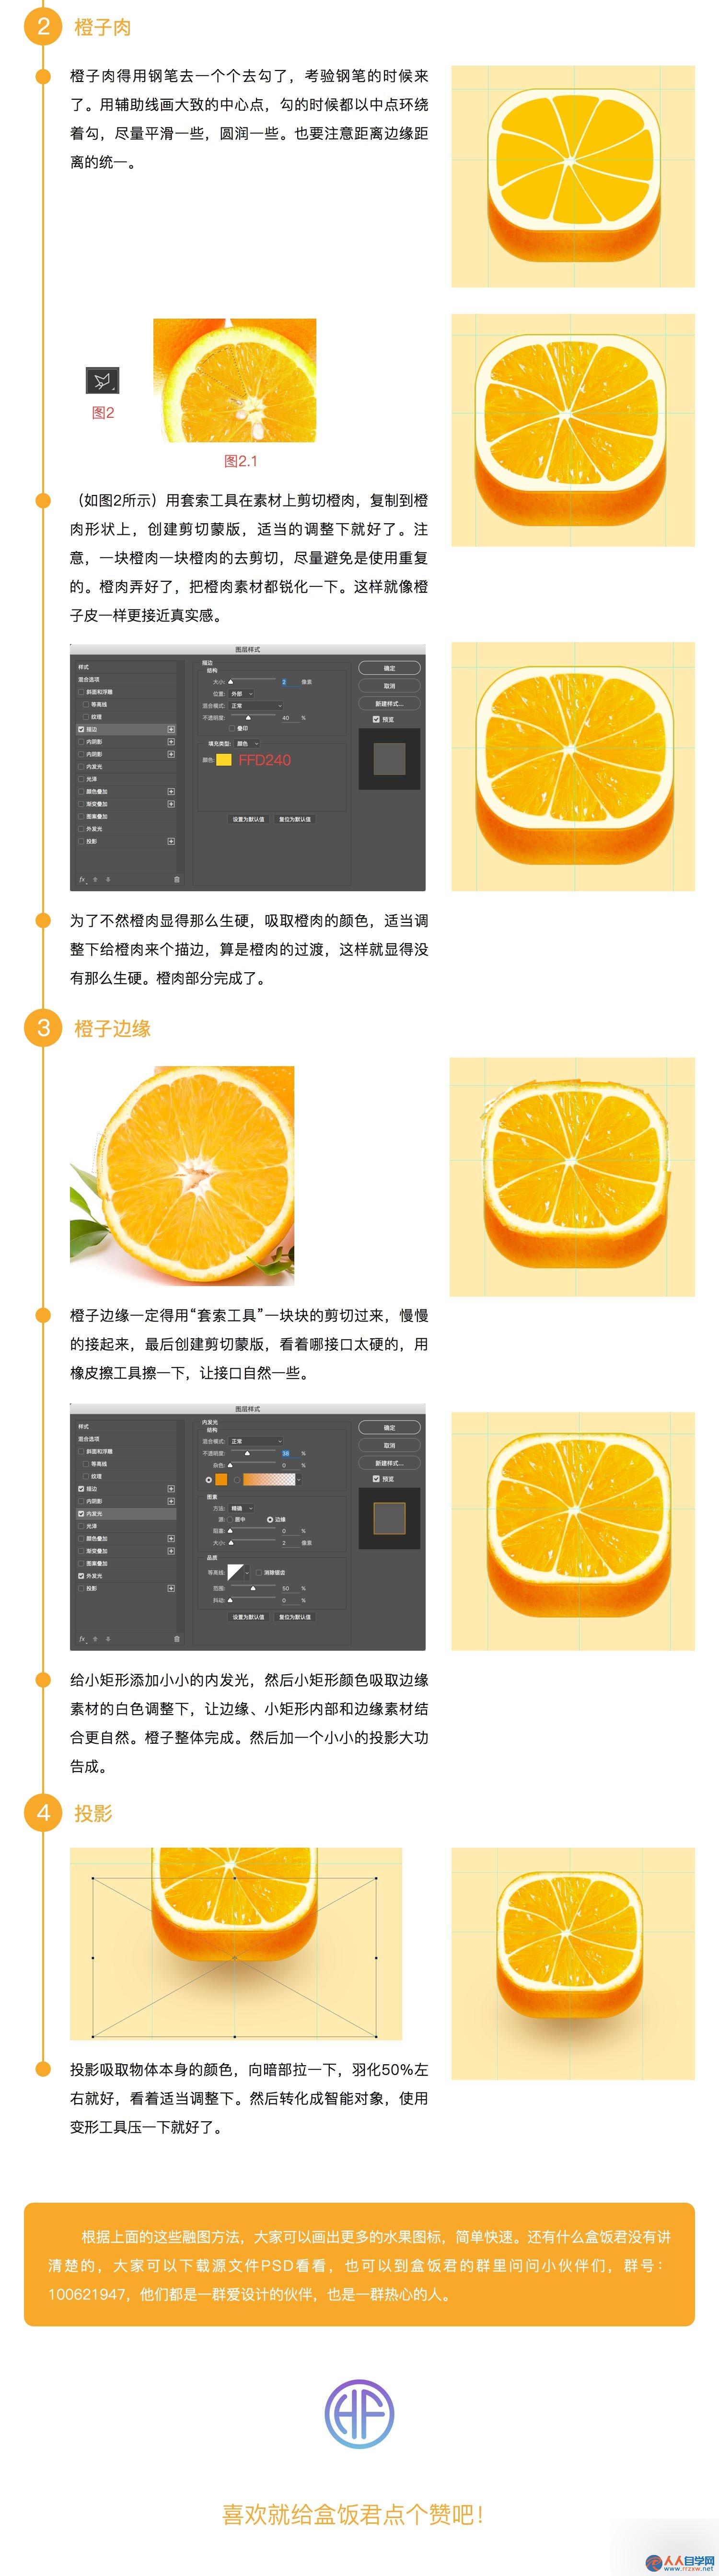 PS鼠绘非常有创意逼真的橙子APP图标